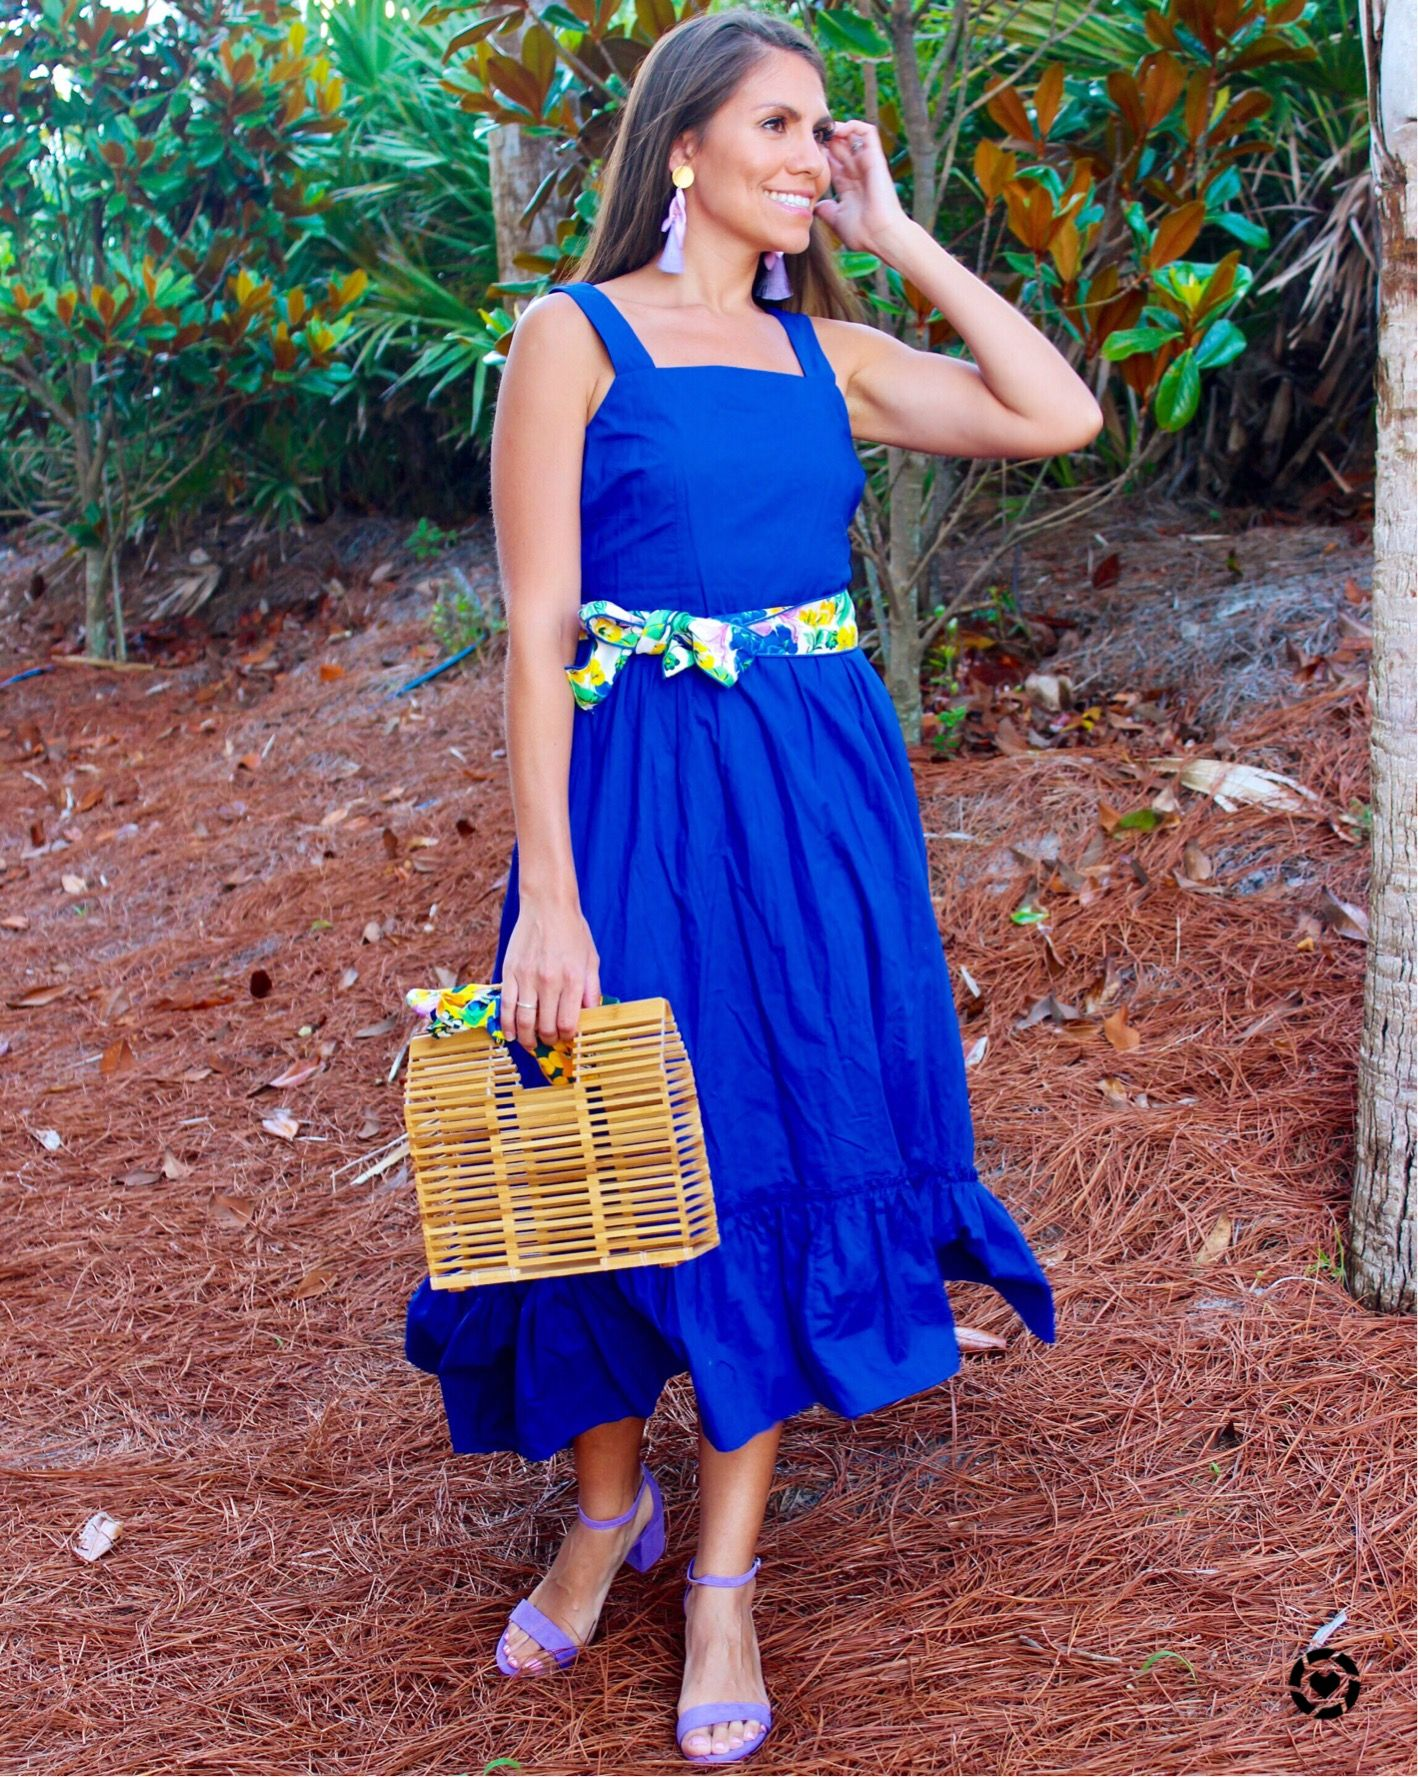 Women S Fashion Women S Outfit Blue Dress Target Dress Target Bamboo Bag Purple Shoes Fashion Target Dresses Womens Fashion Dresses Casual [ 1777 x 1418 Pixel ]